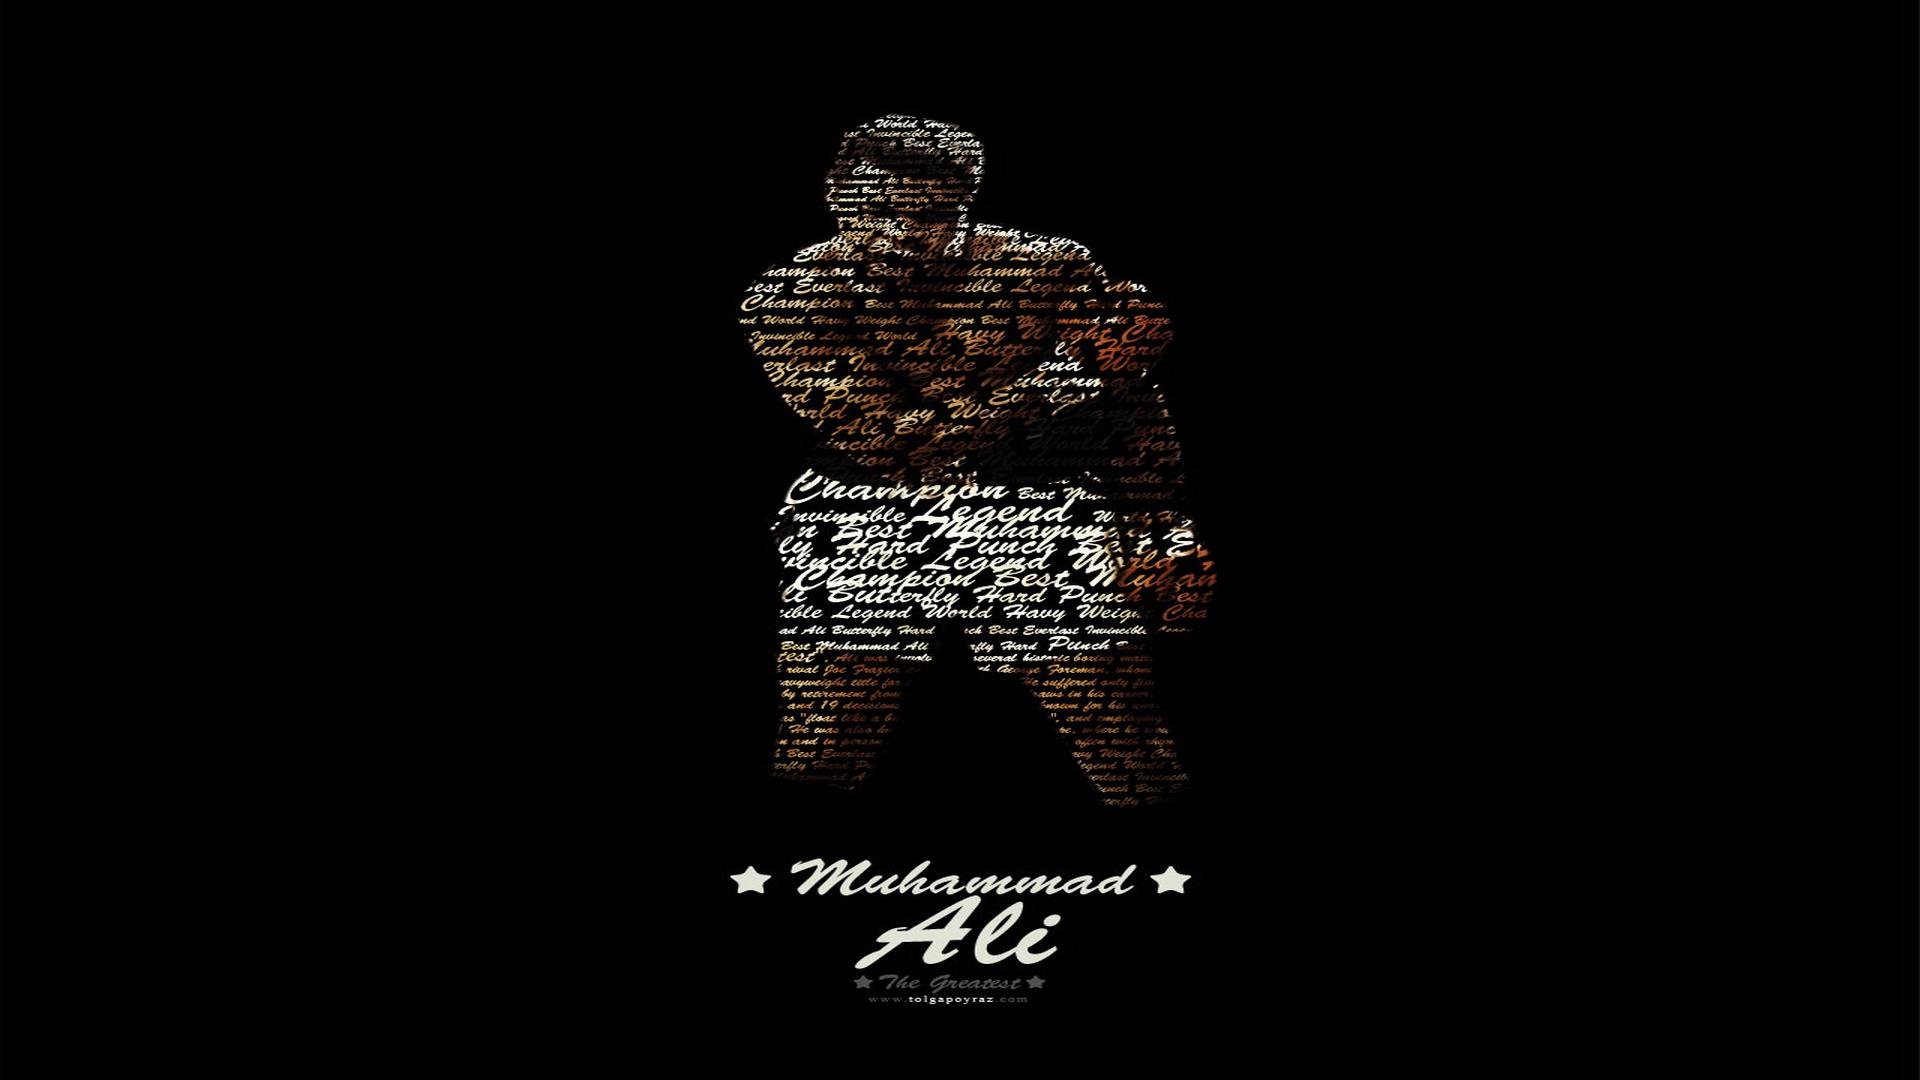 Muhammad Ali Wallpapers 17 HD Desktop Wallpapers 1920x1080